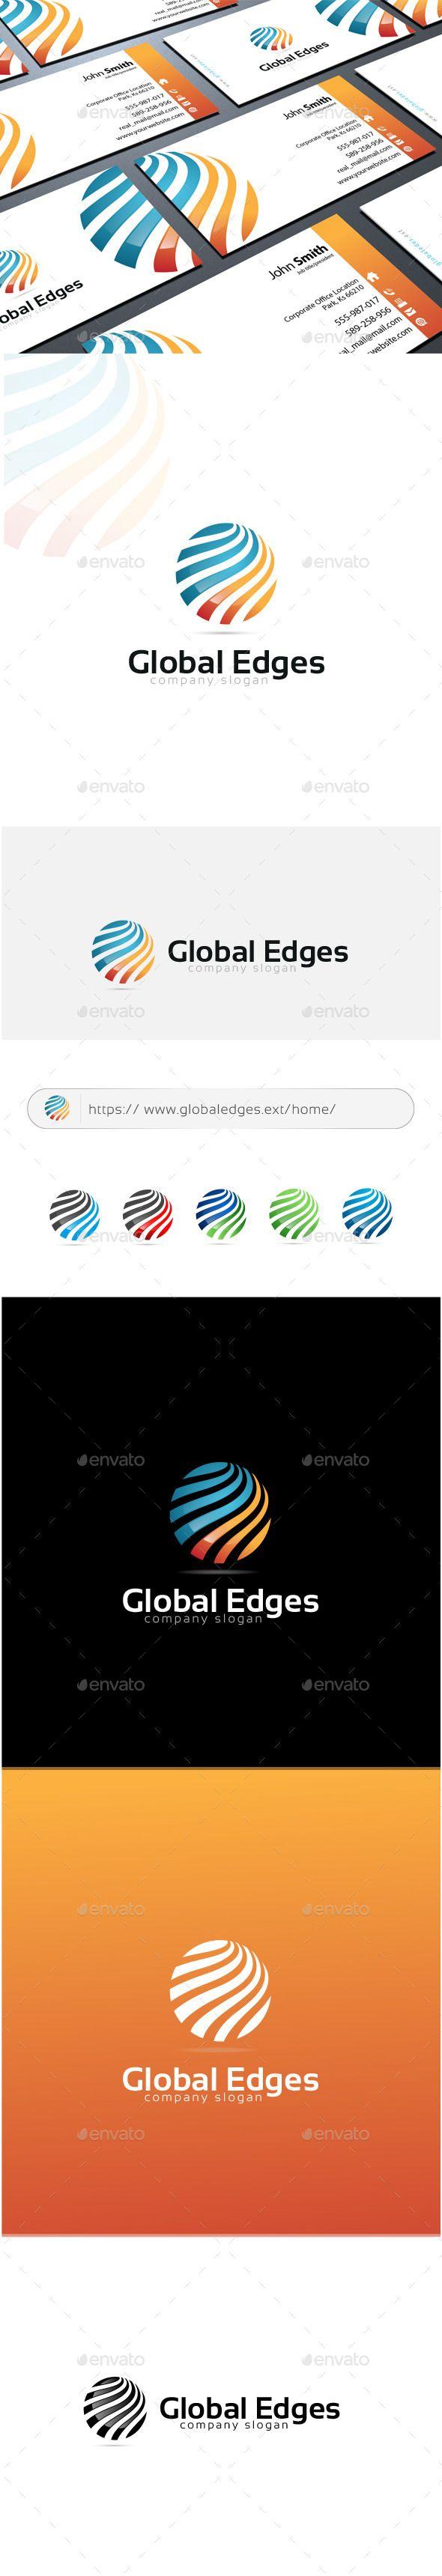 Global Edges  Logo Design Template Vector #logotype Download it here: http://graphicriver.net/item/global-edges-logo/11334621?s_rank=895?ref=nesto